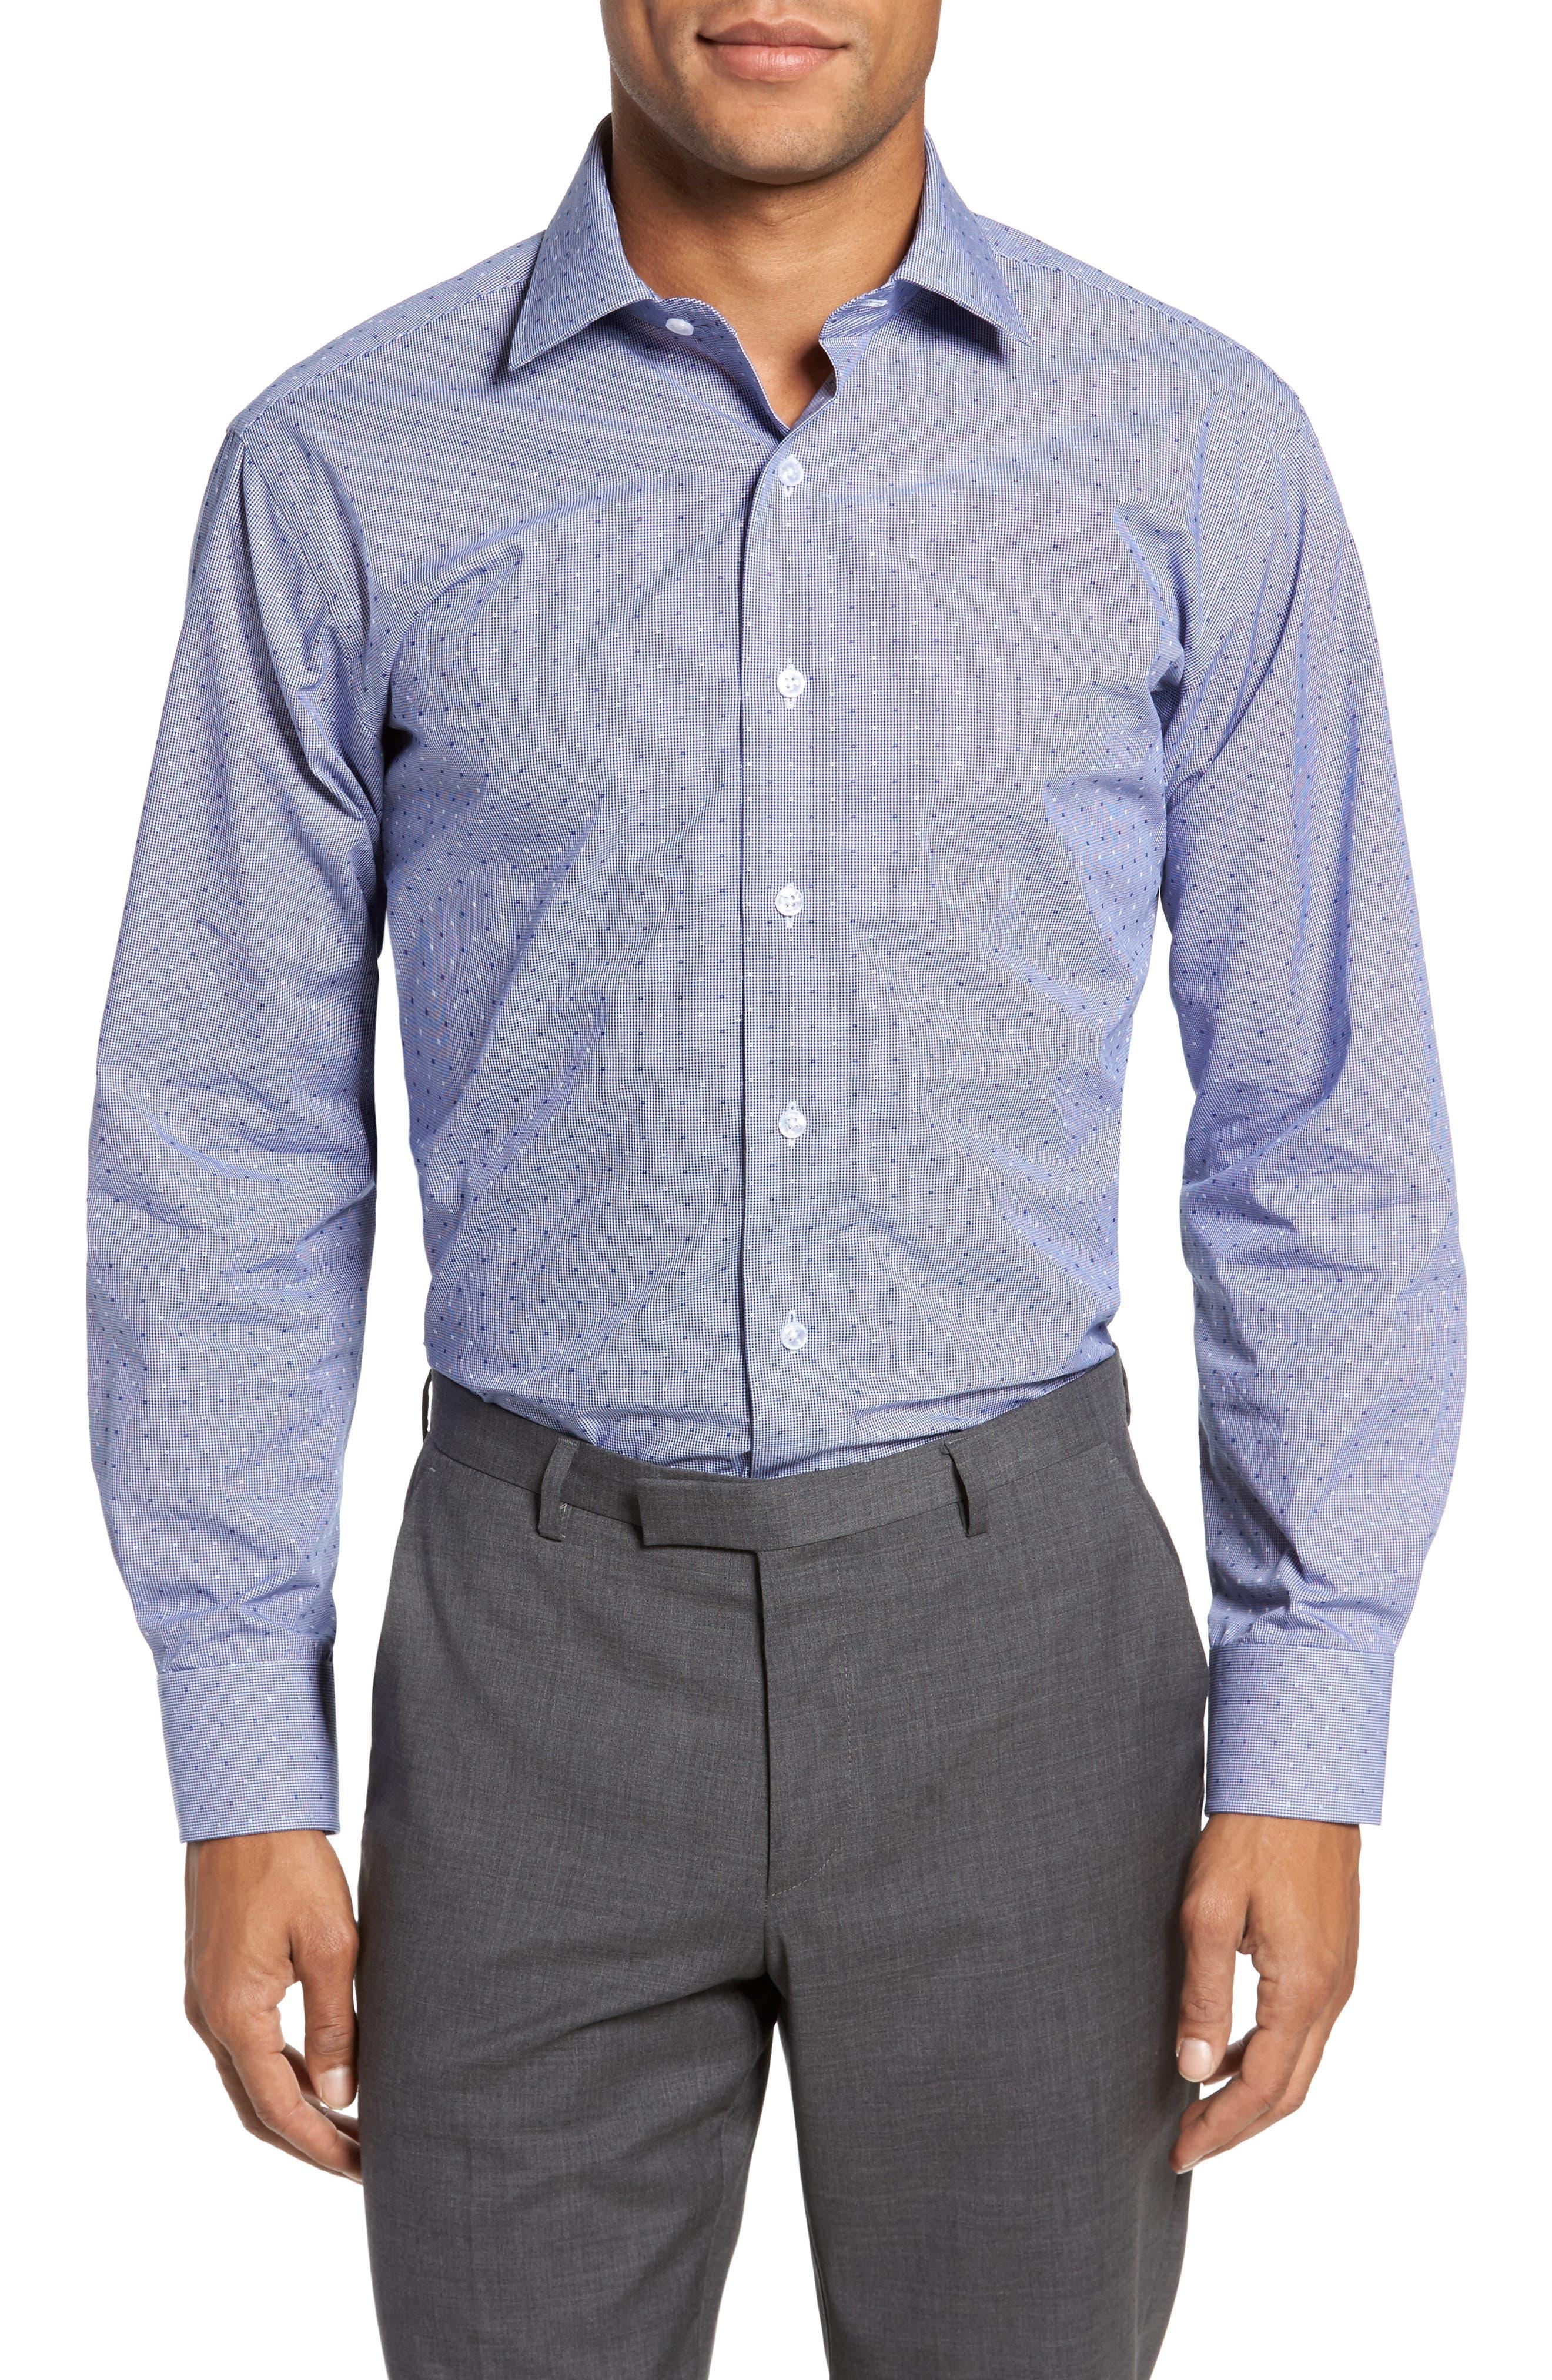 LORENZO UOMO Trim Fit Check Dress Shirt, Main, color, NAVY